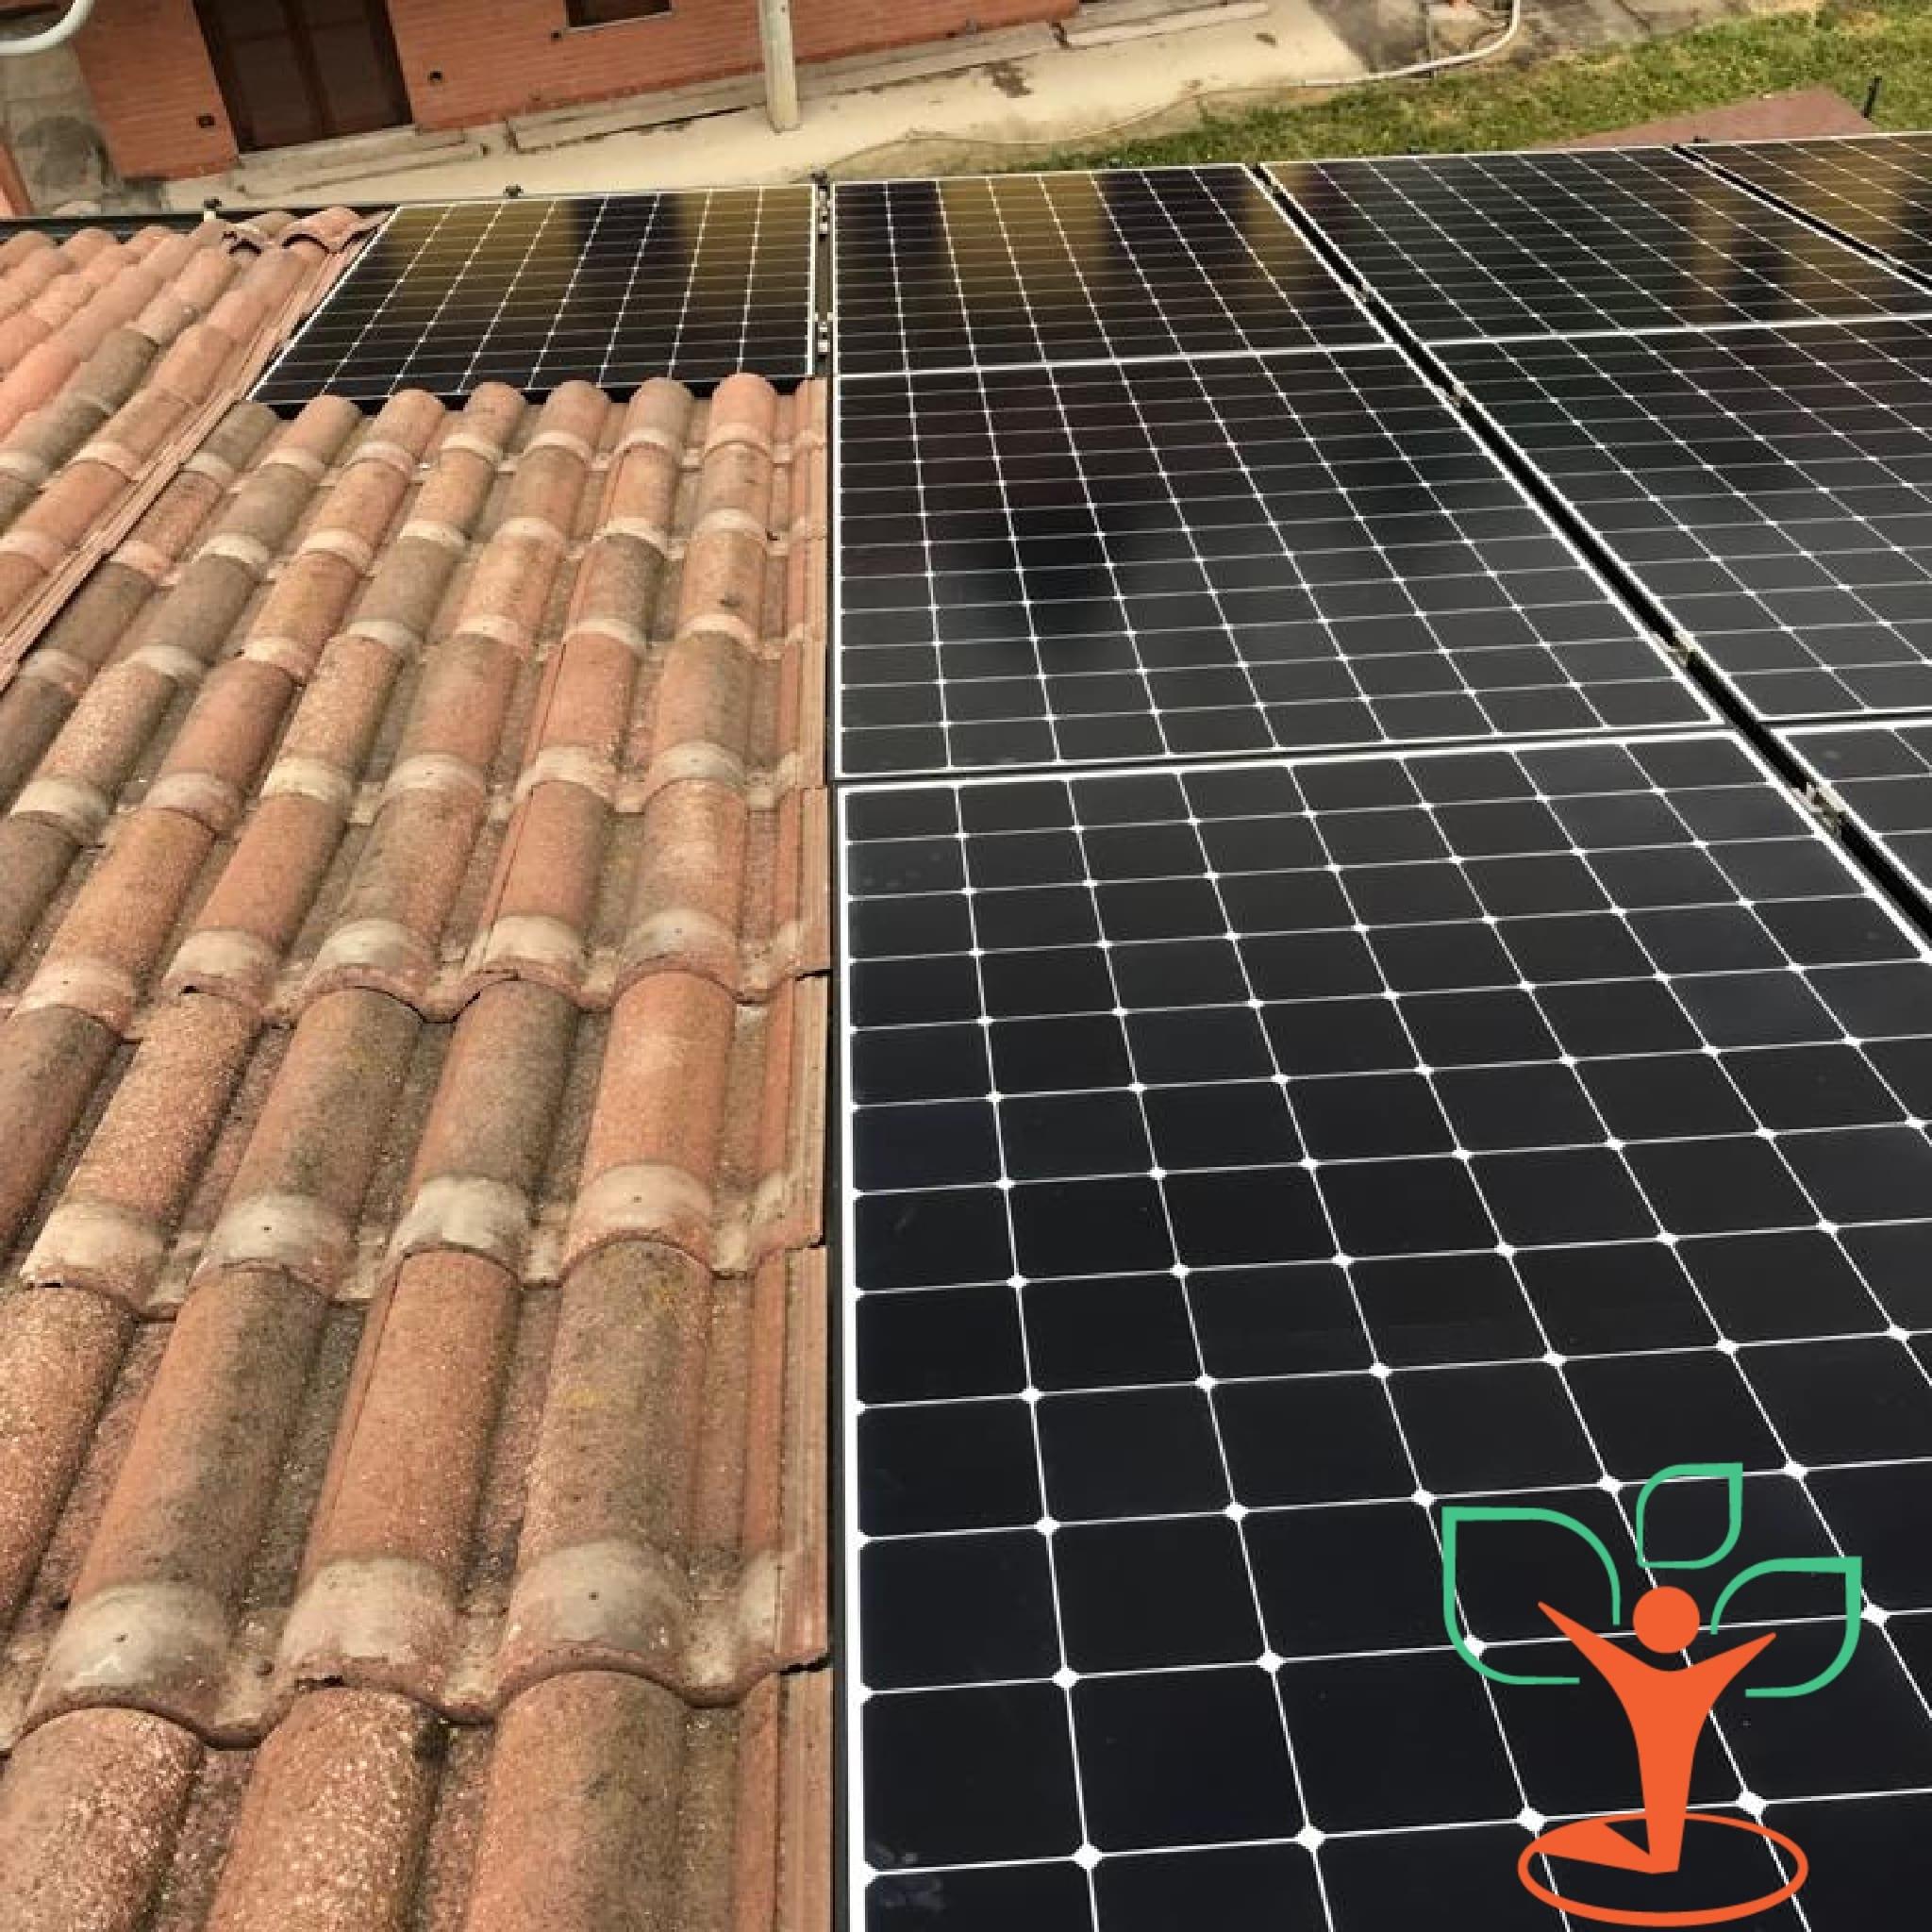 Revamping impianto fotovoltaico a Galgagnano (LO)